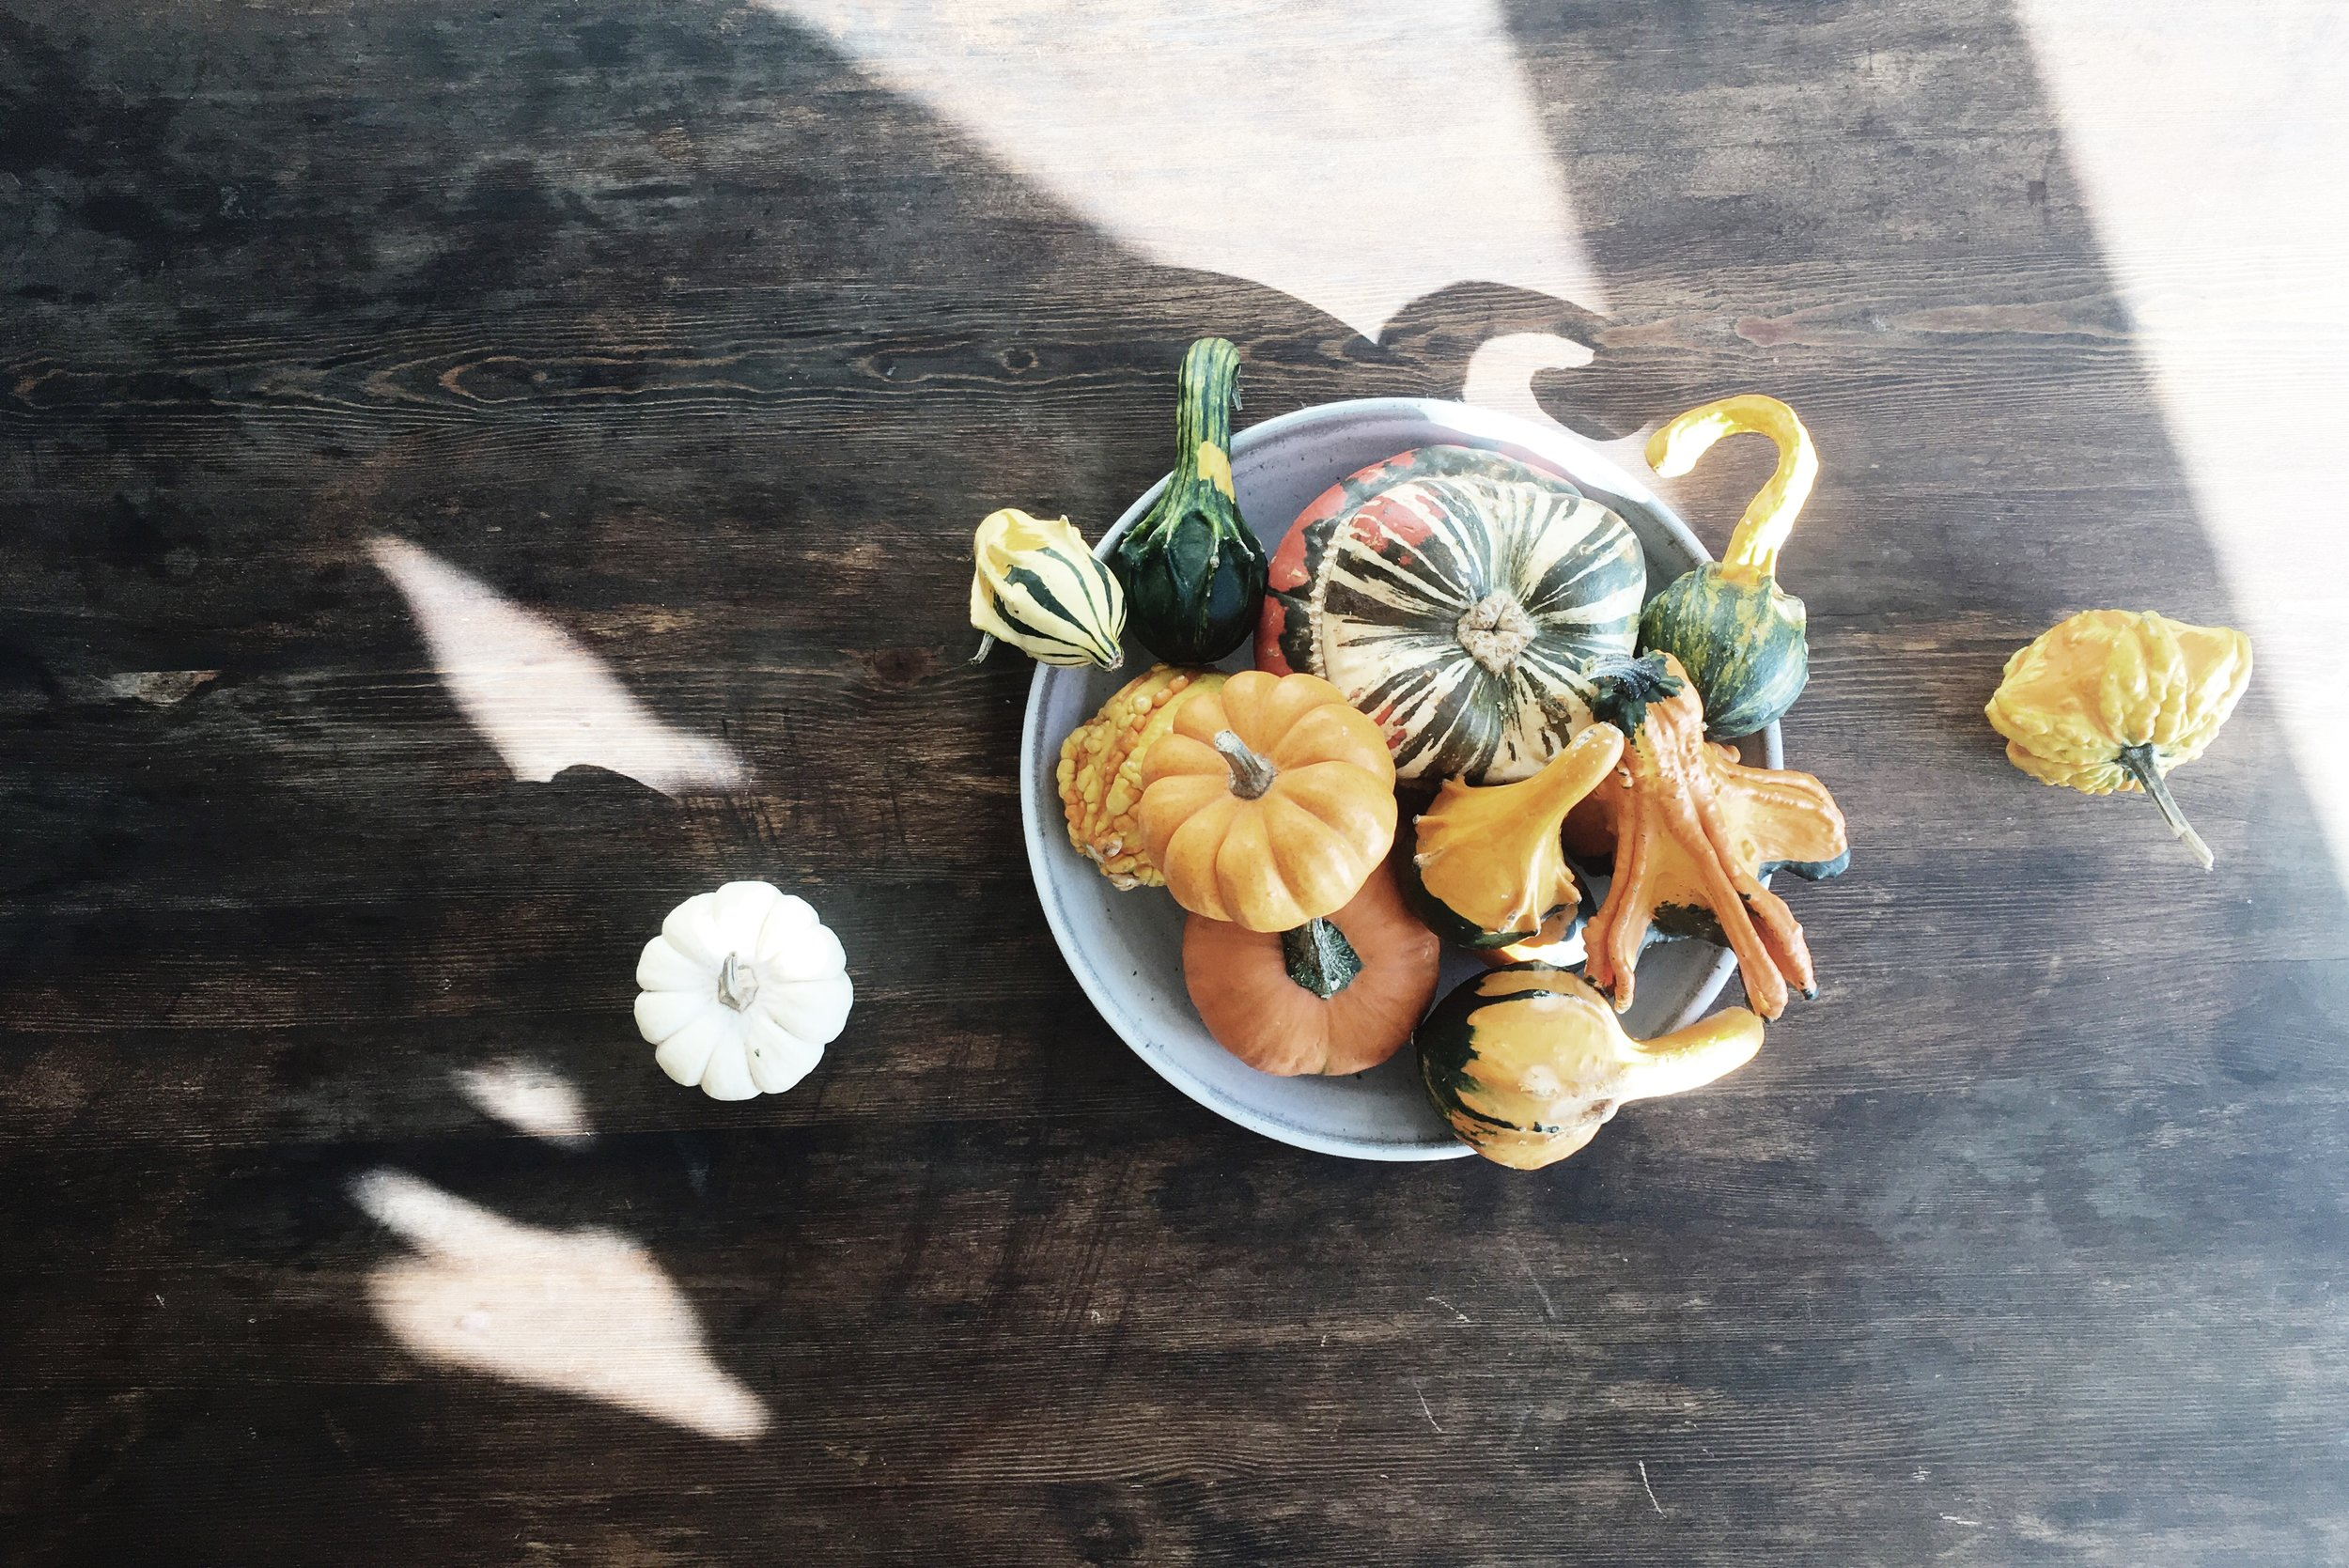 gourd downey.JPG